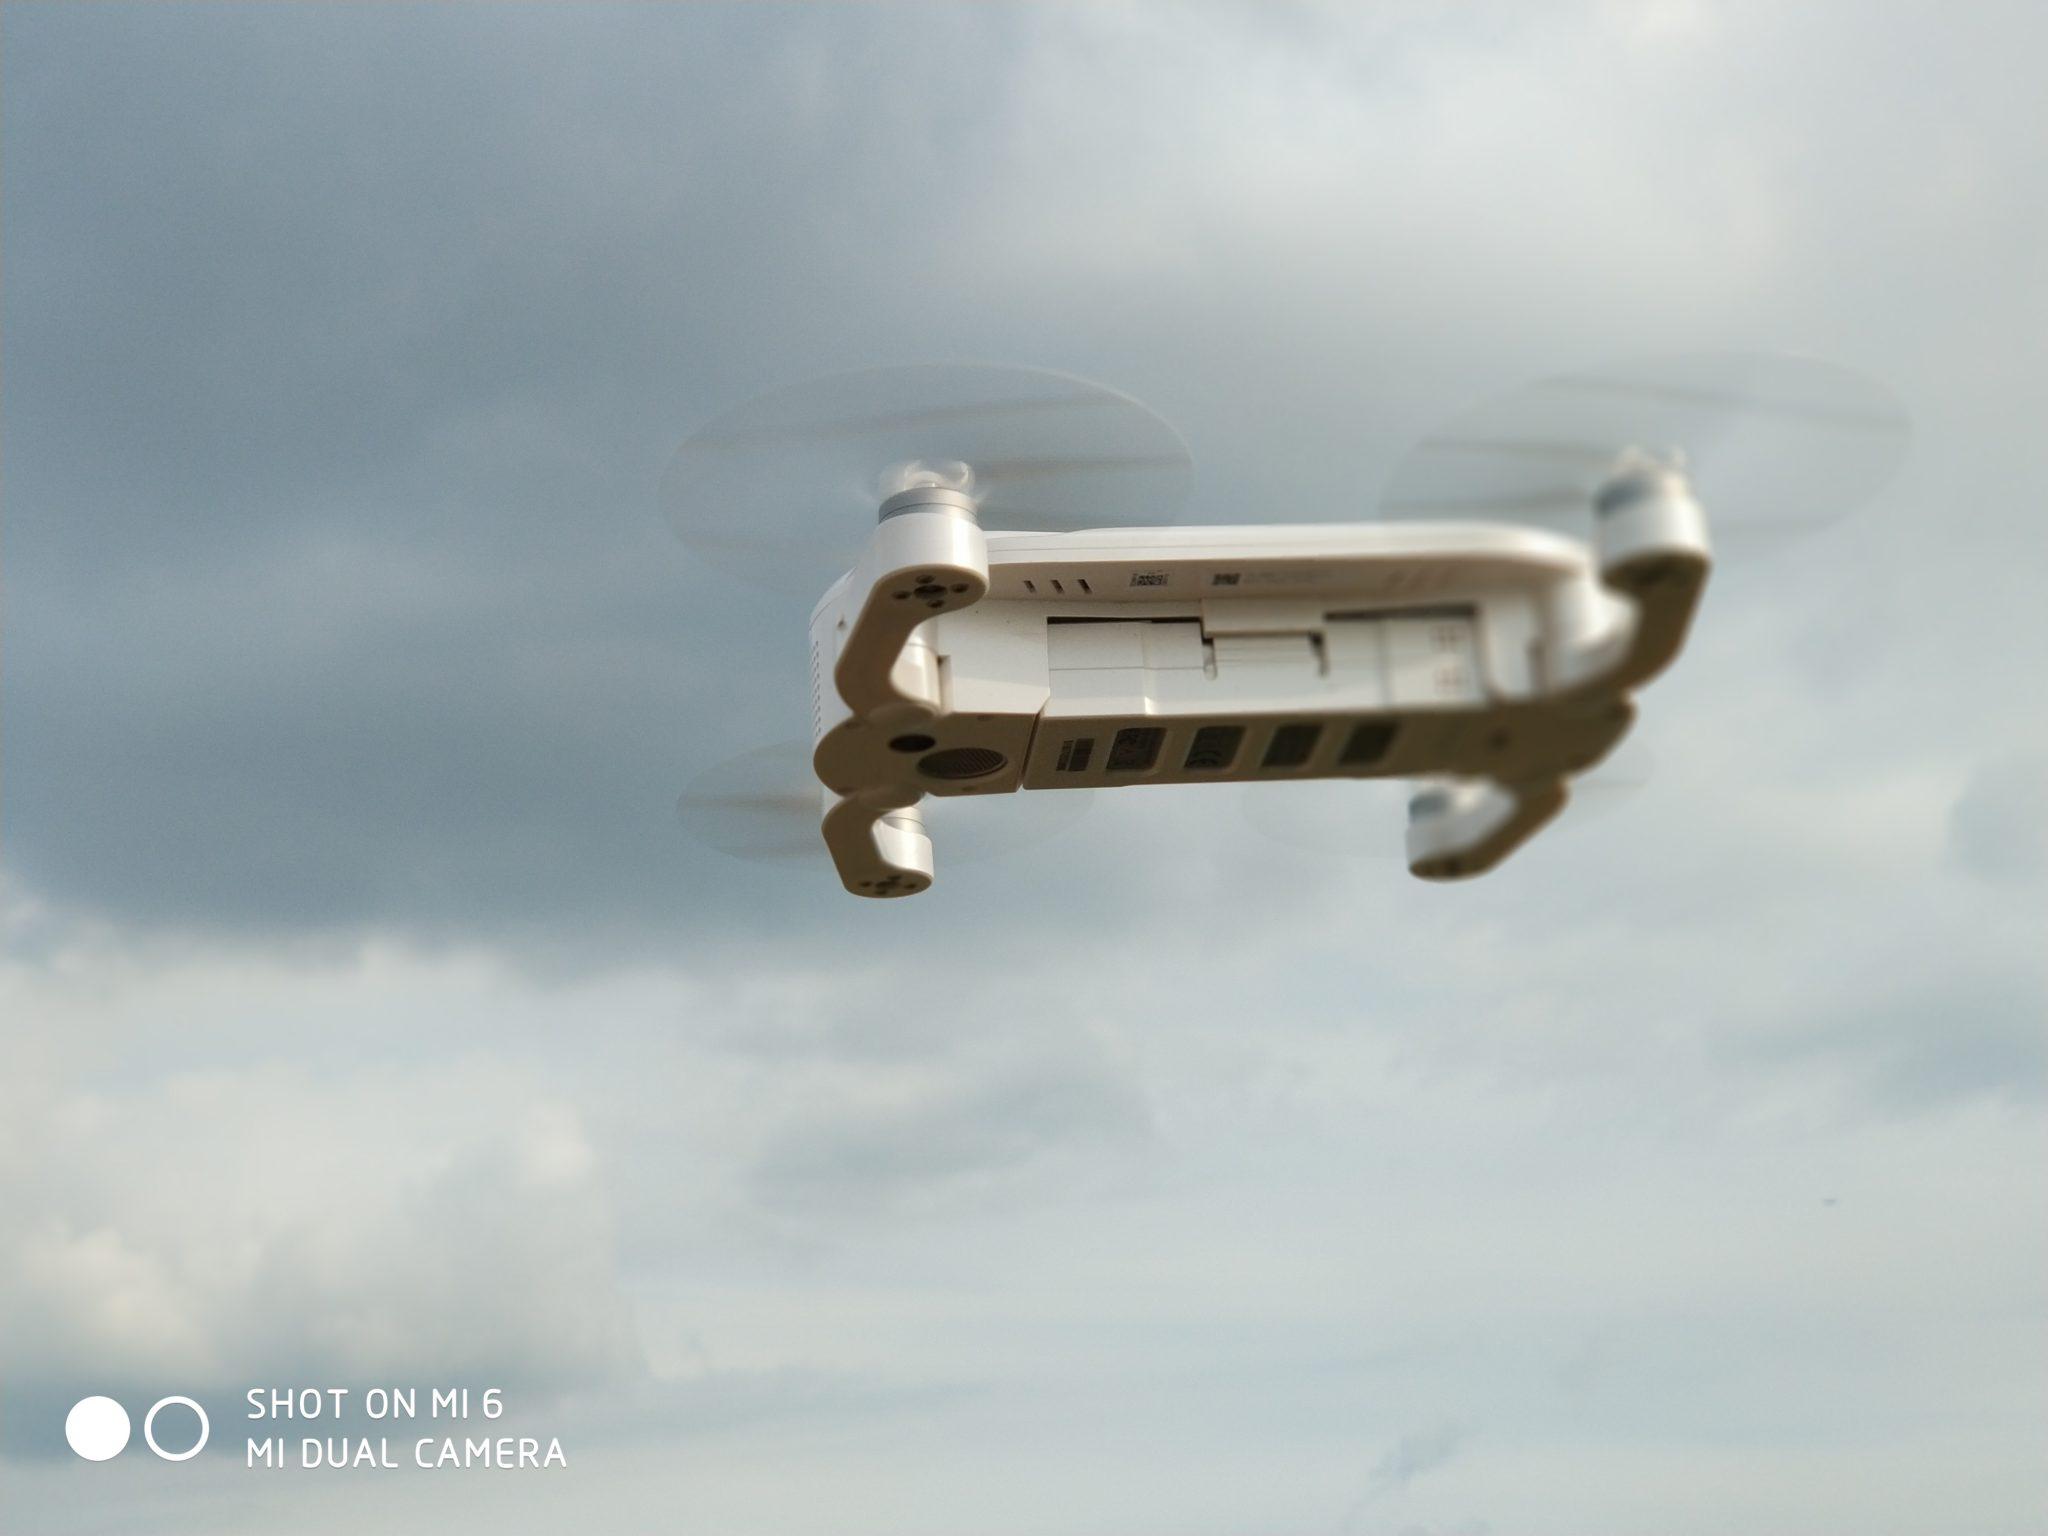 Xiaomi Mi6 デュアルカメラ撮影 裏山頂上 半分背景ボケ